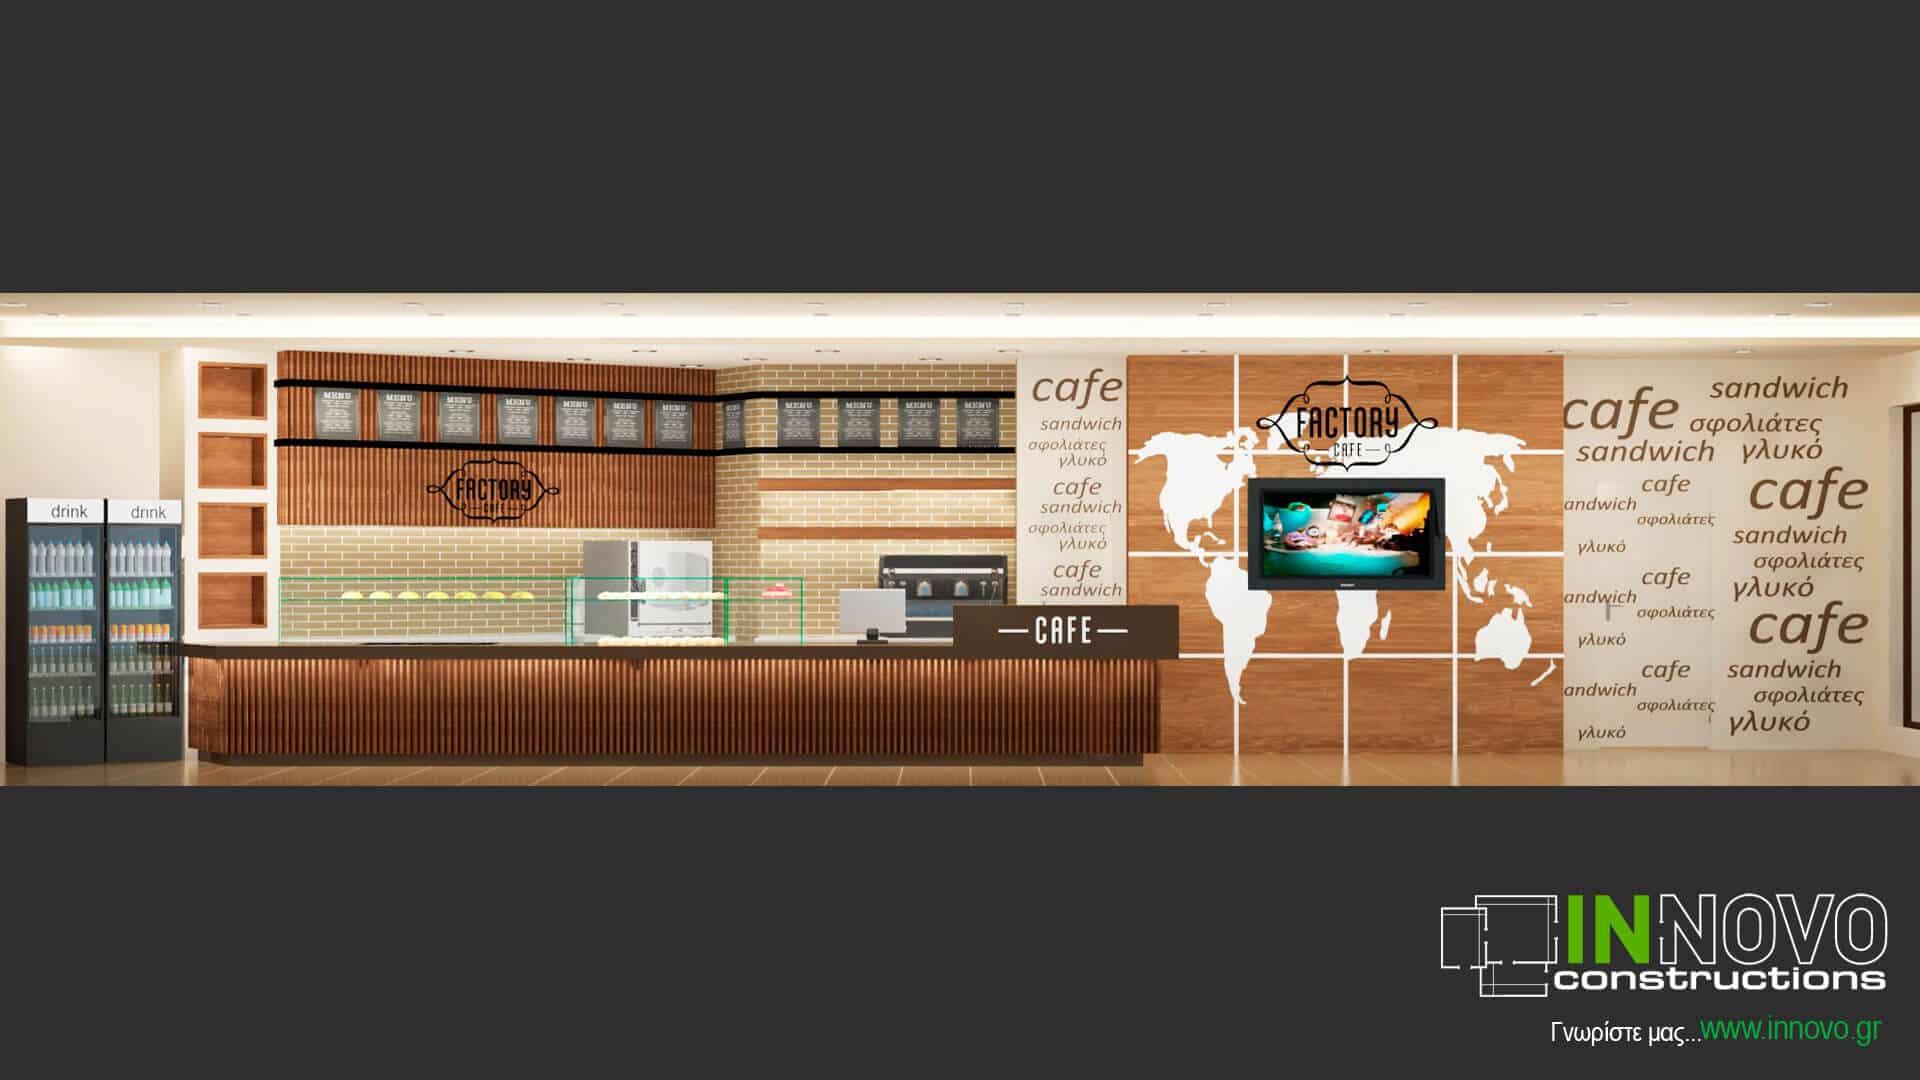 kataskevi-snack-cafe-construction-snack-gerakas-1842-7